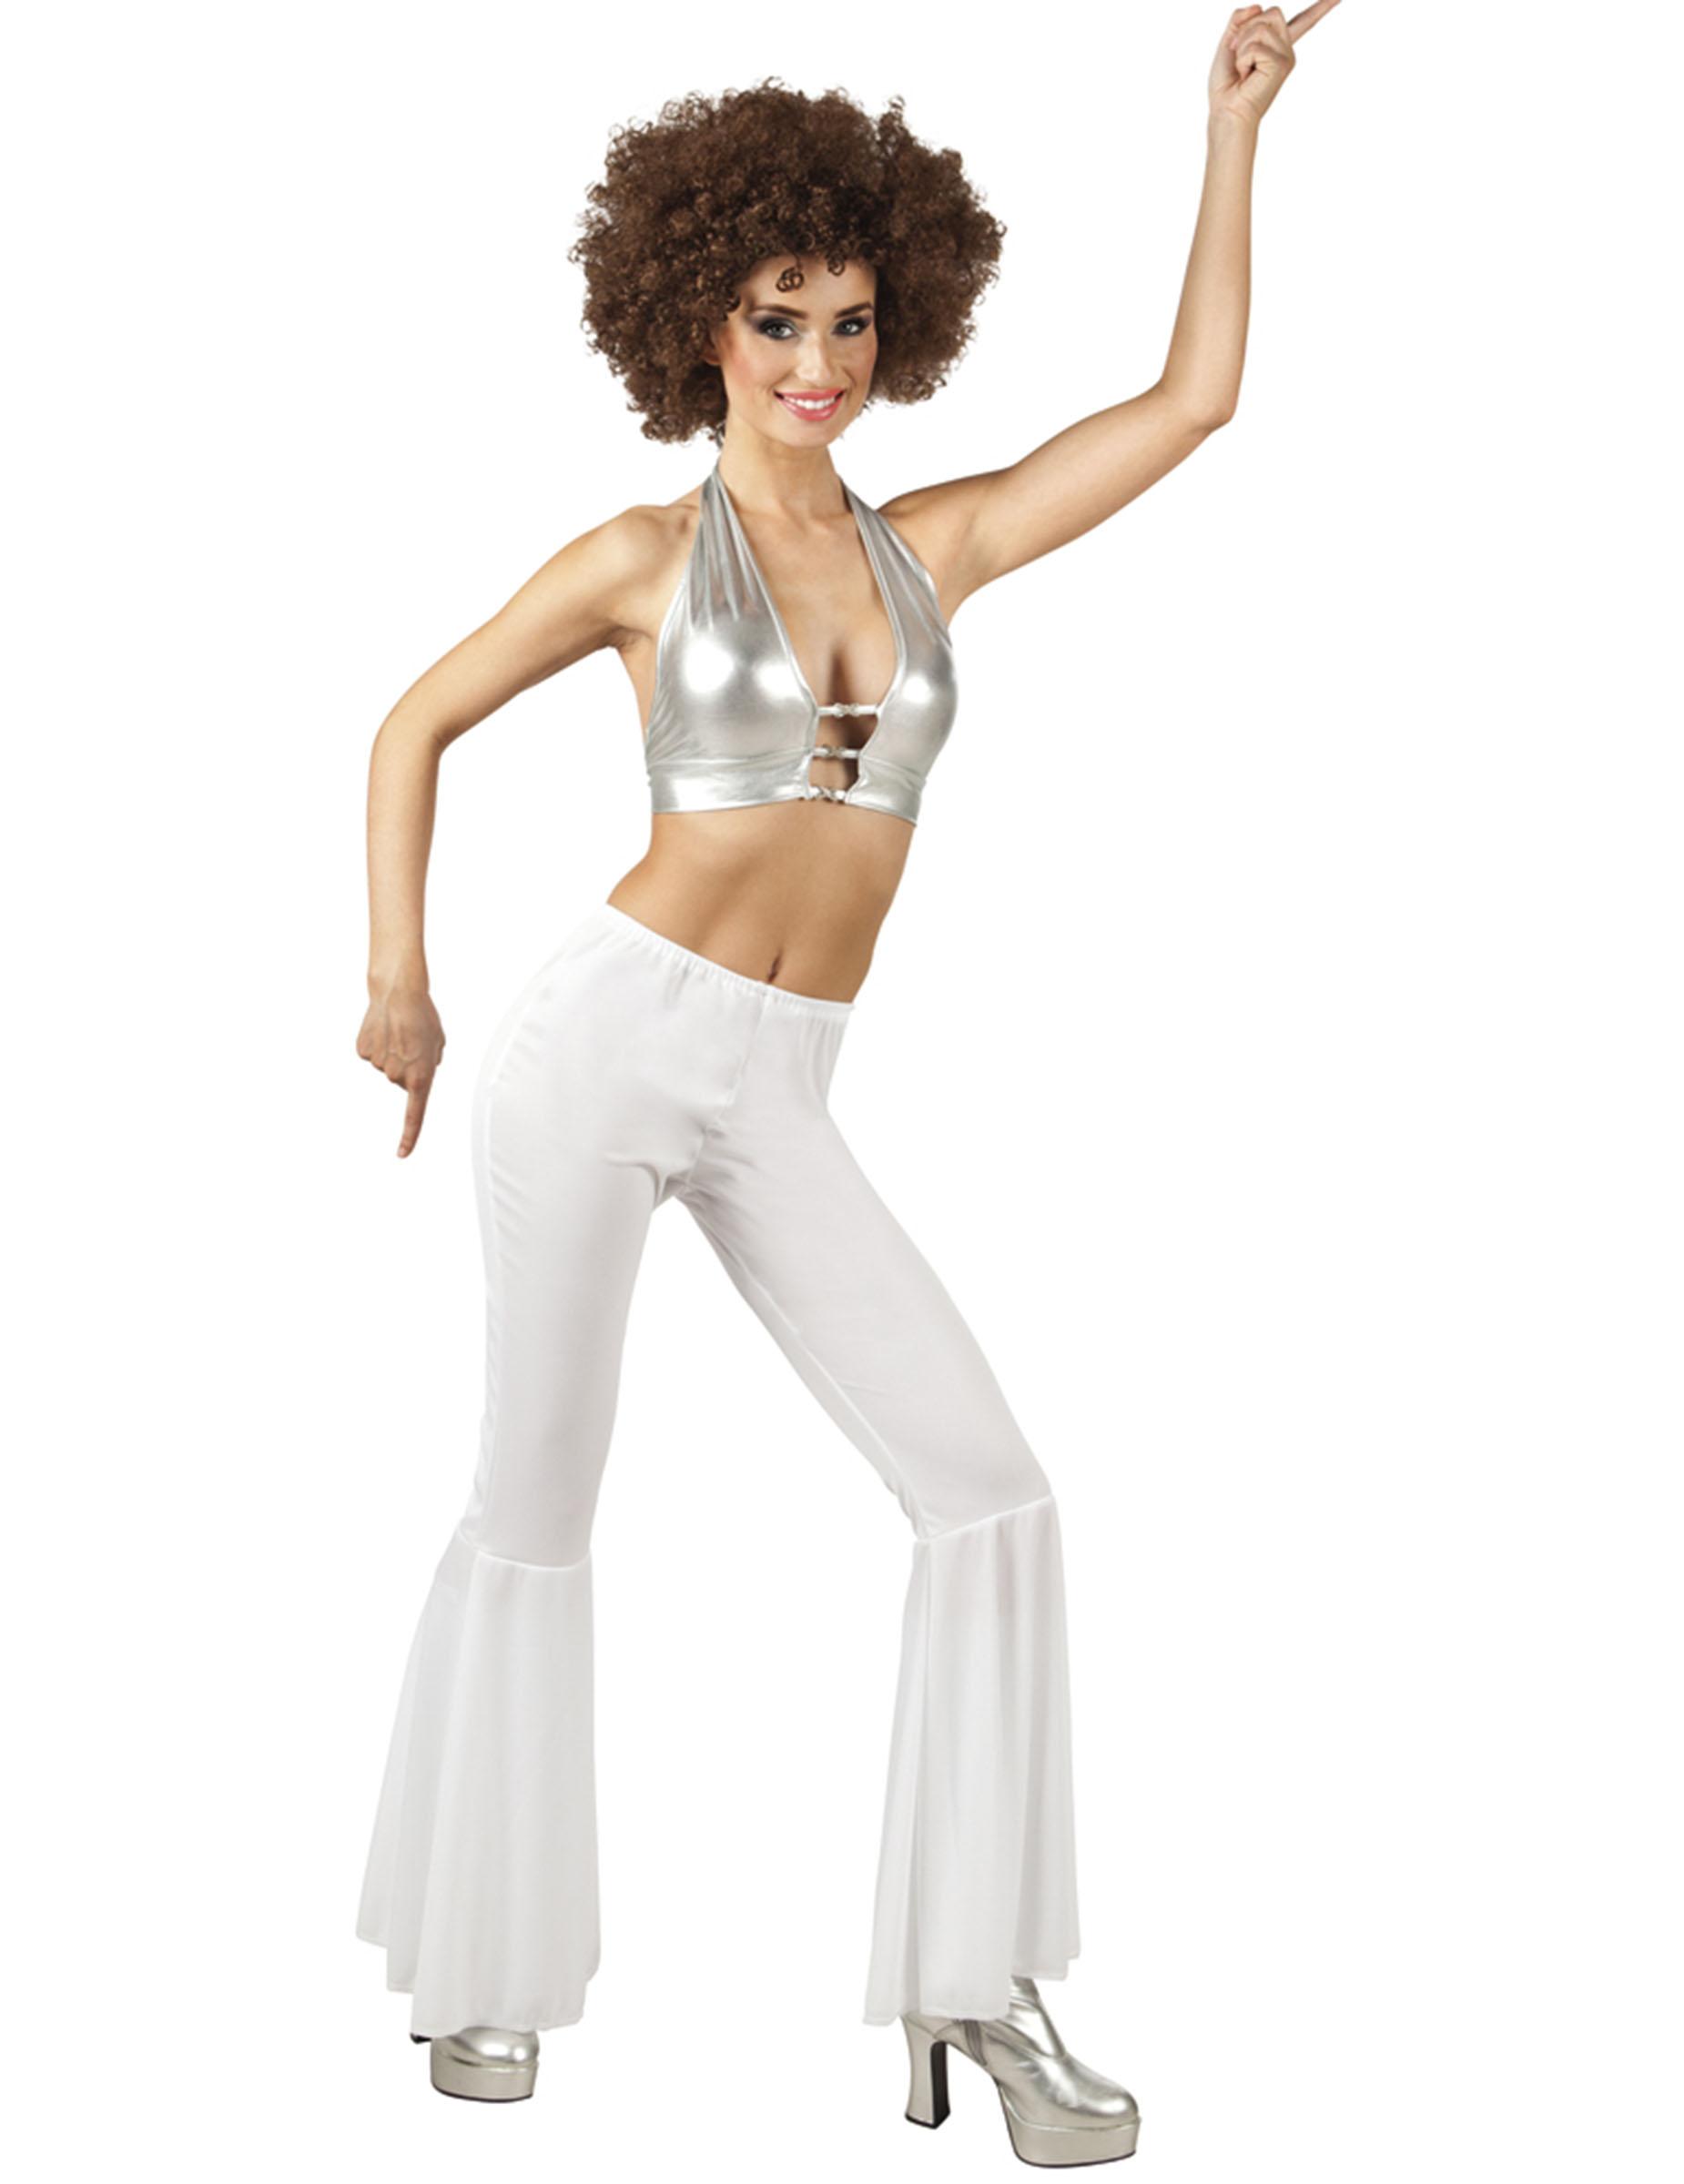 Pantalon Pantalon Blanc Pantalon Disco Disco Disco Blanc Blanc Femme Femme Femme WH2ED9IYe